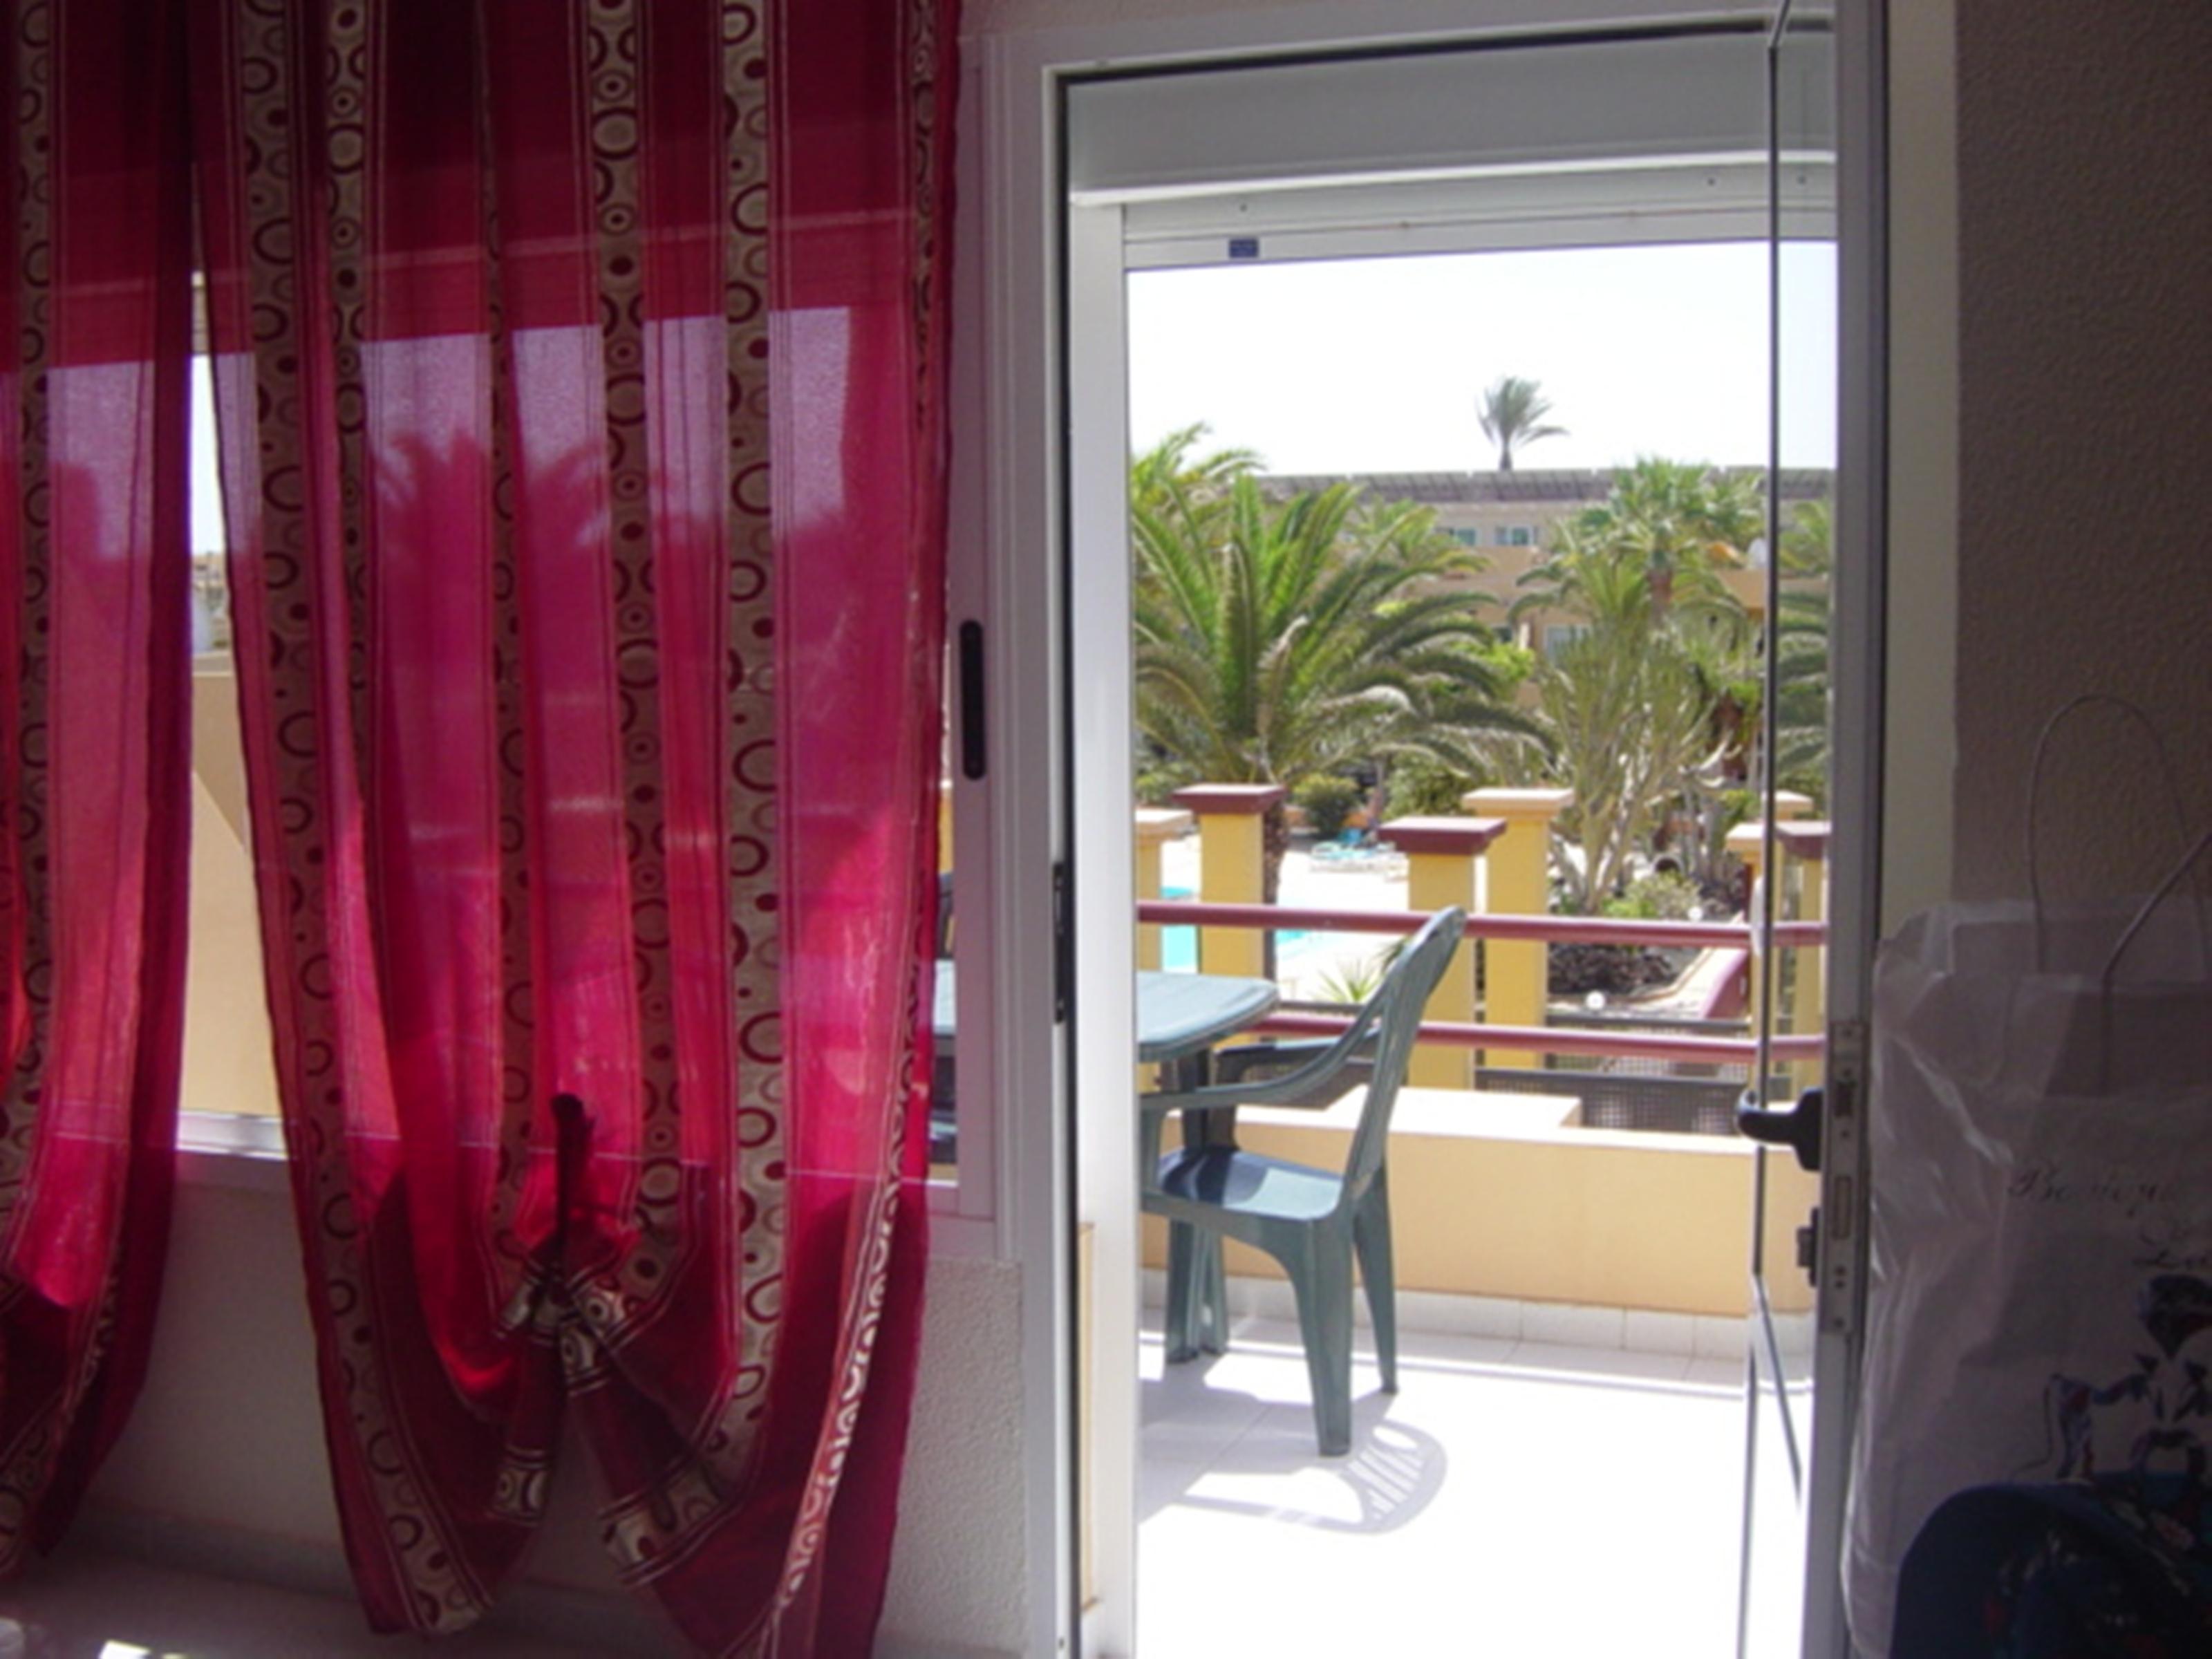 Ferienwohnung Wohnung El Mirador -Residencial Las Dunas - (2196686), Corralejo, Fuerteventura, Kanarische Inseln, Spanien, Bild 5